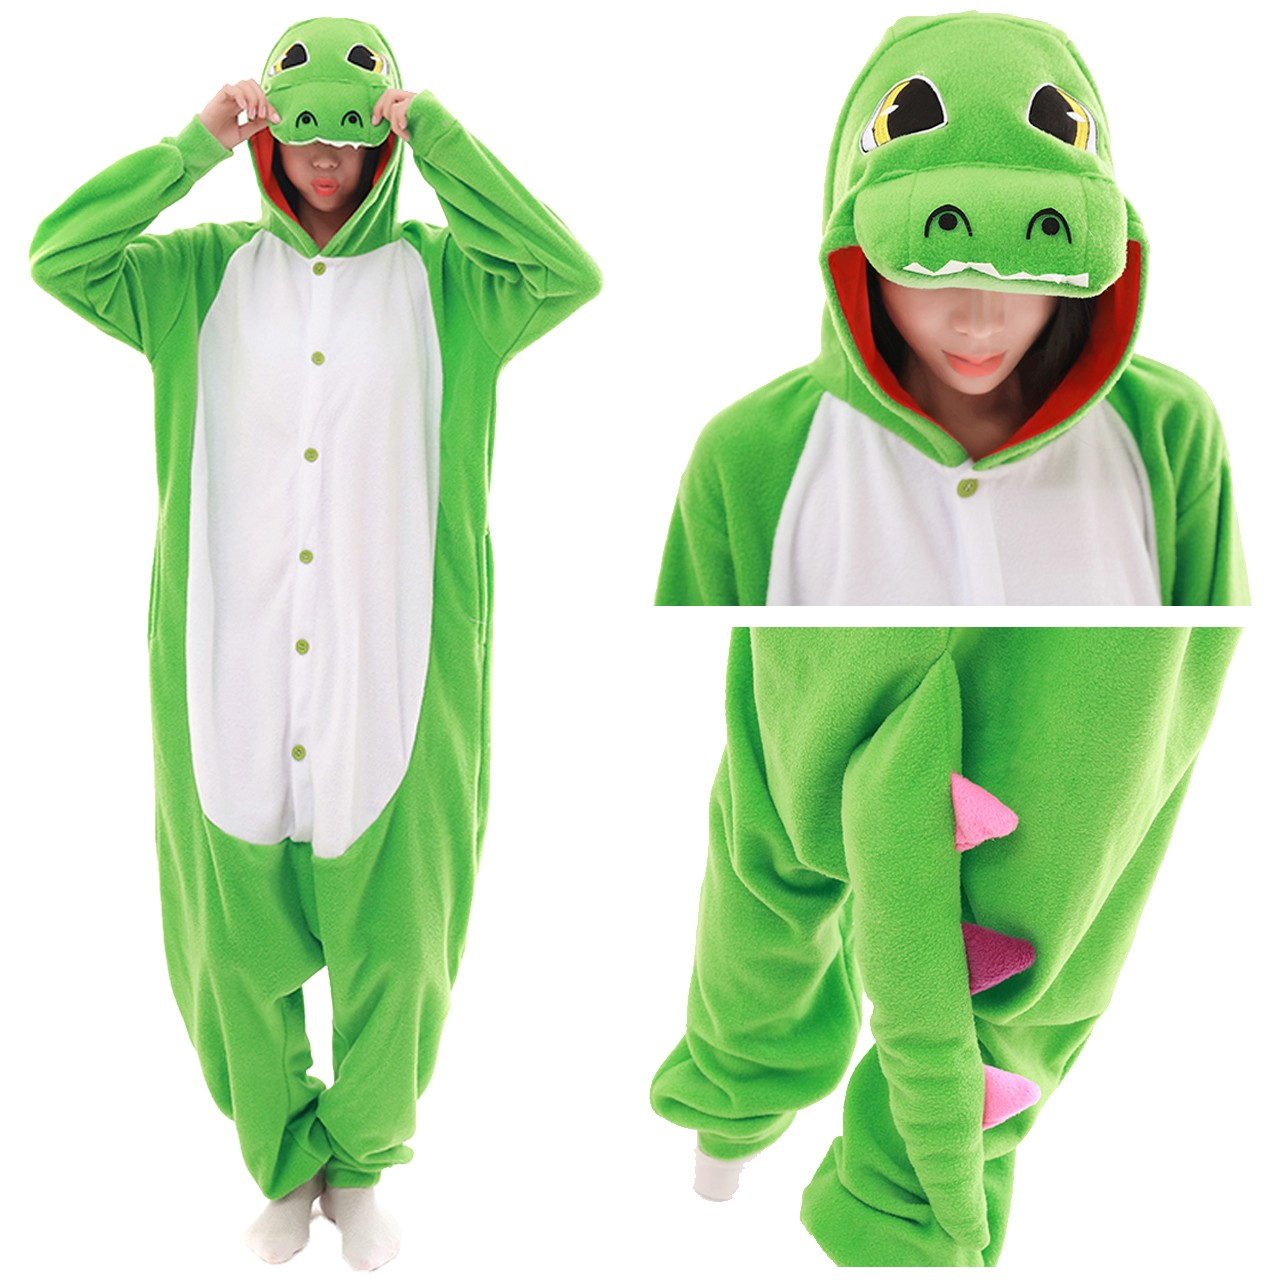 ec7ff5767c Green Crocodile Onesie Animal Kigurumi Pajama Women   Men Halloween  Carnival Costumes